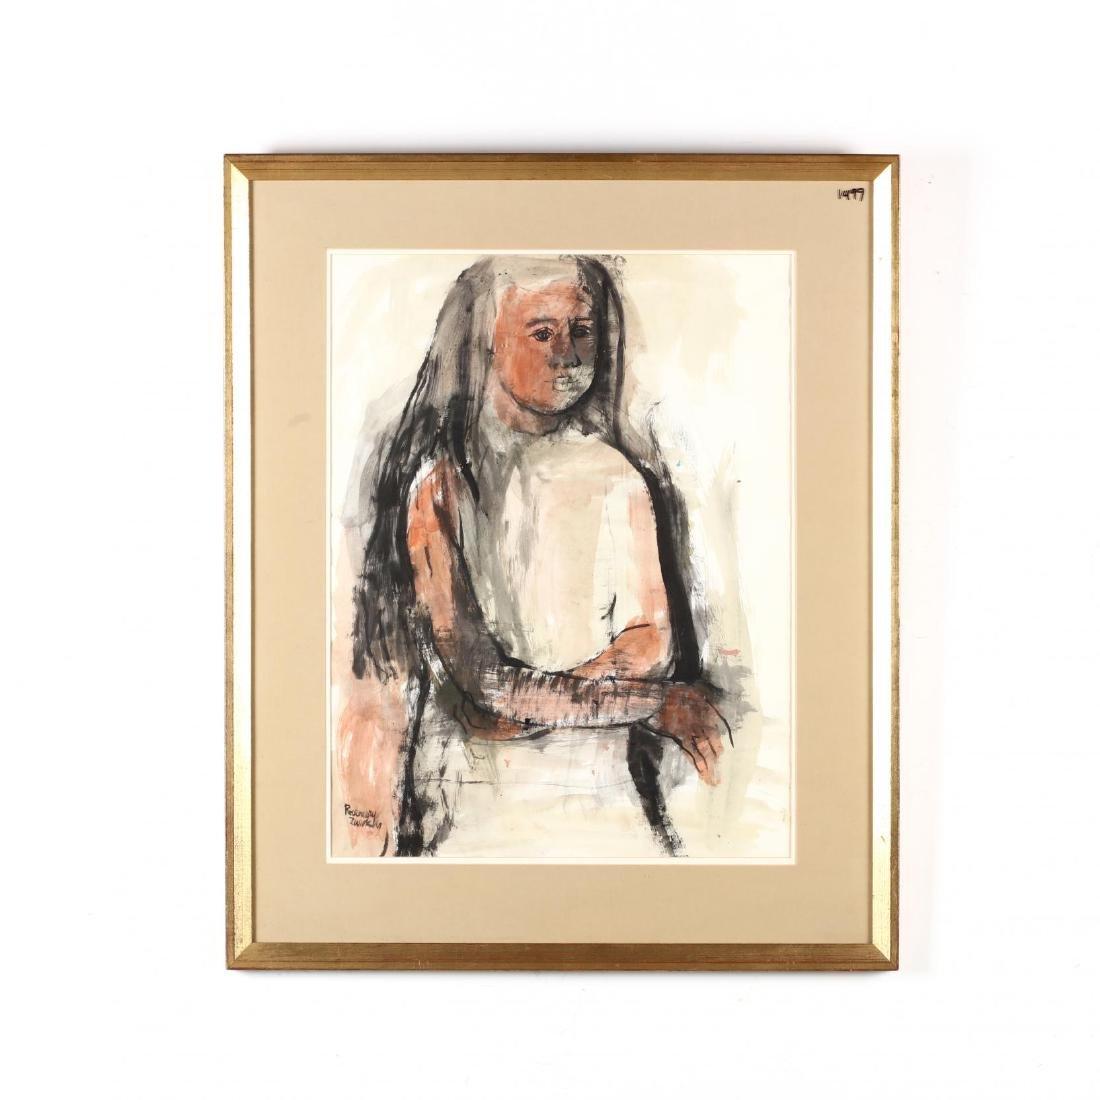 Rosemary Zwick (IL, 1925-1995), Three-Quarter Length